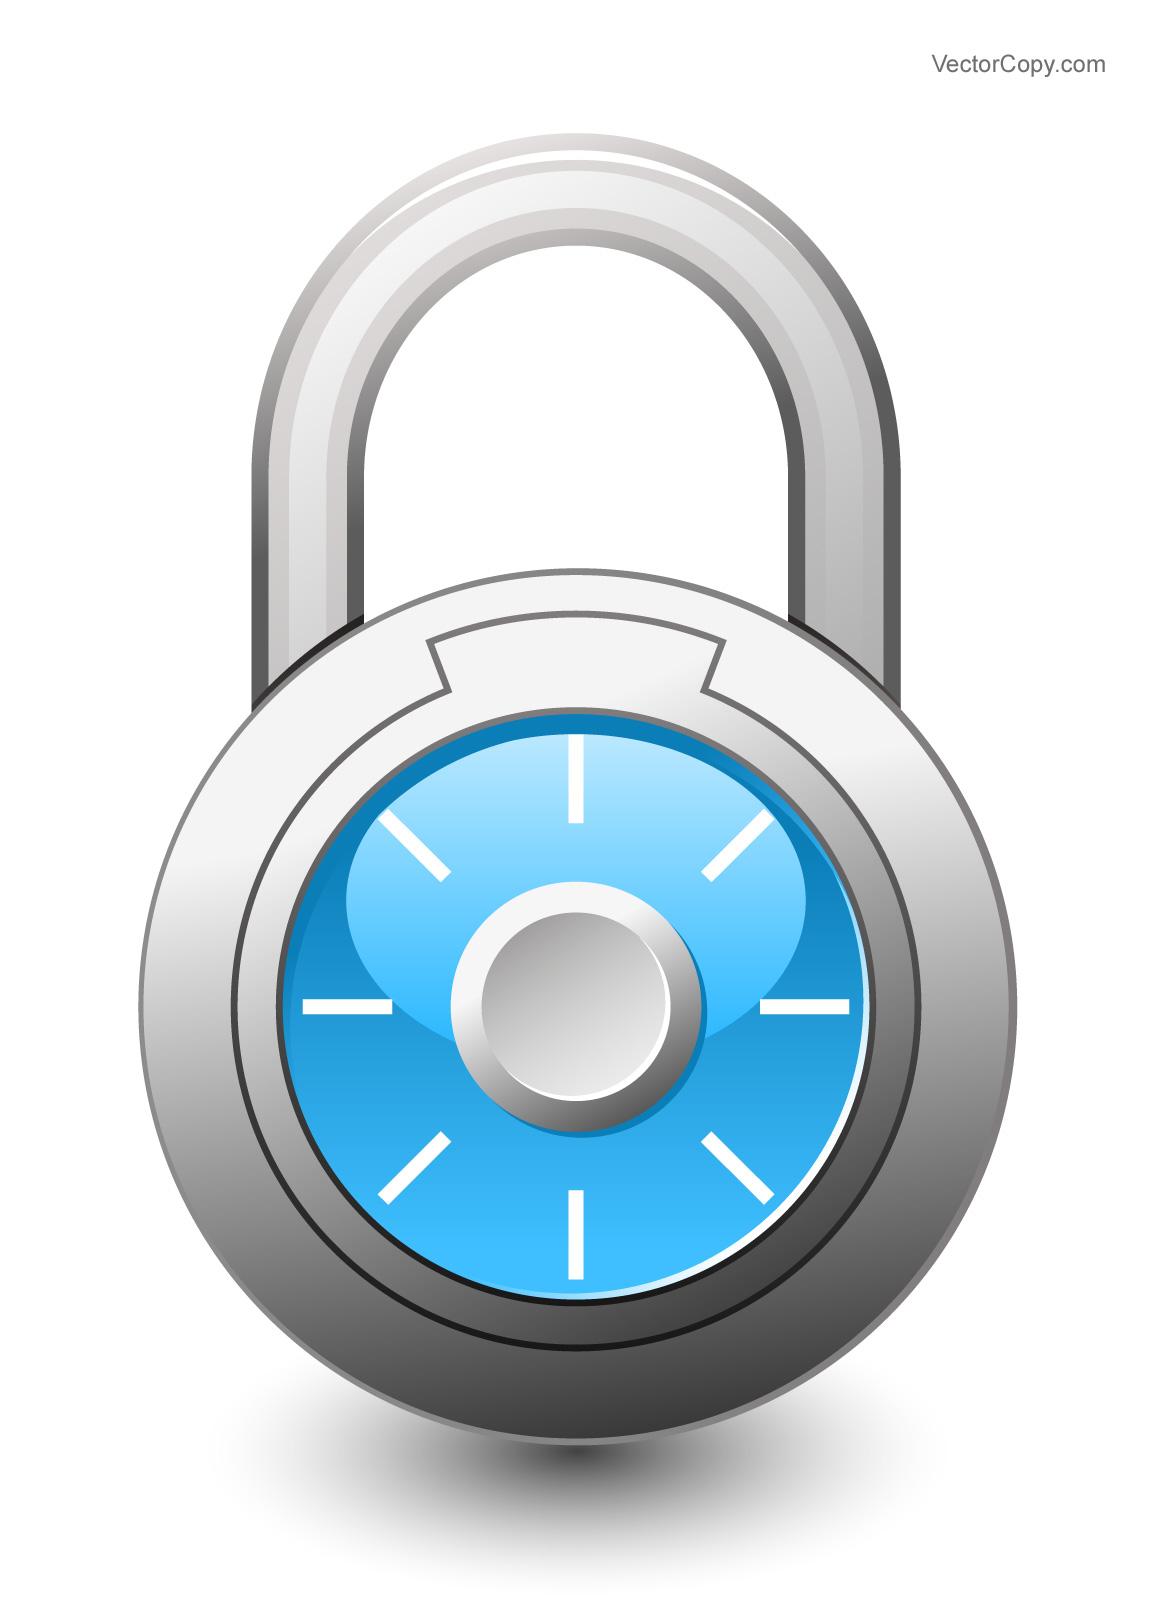 Combination lock clipart.